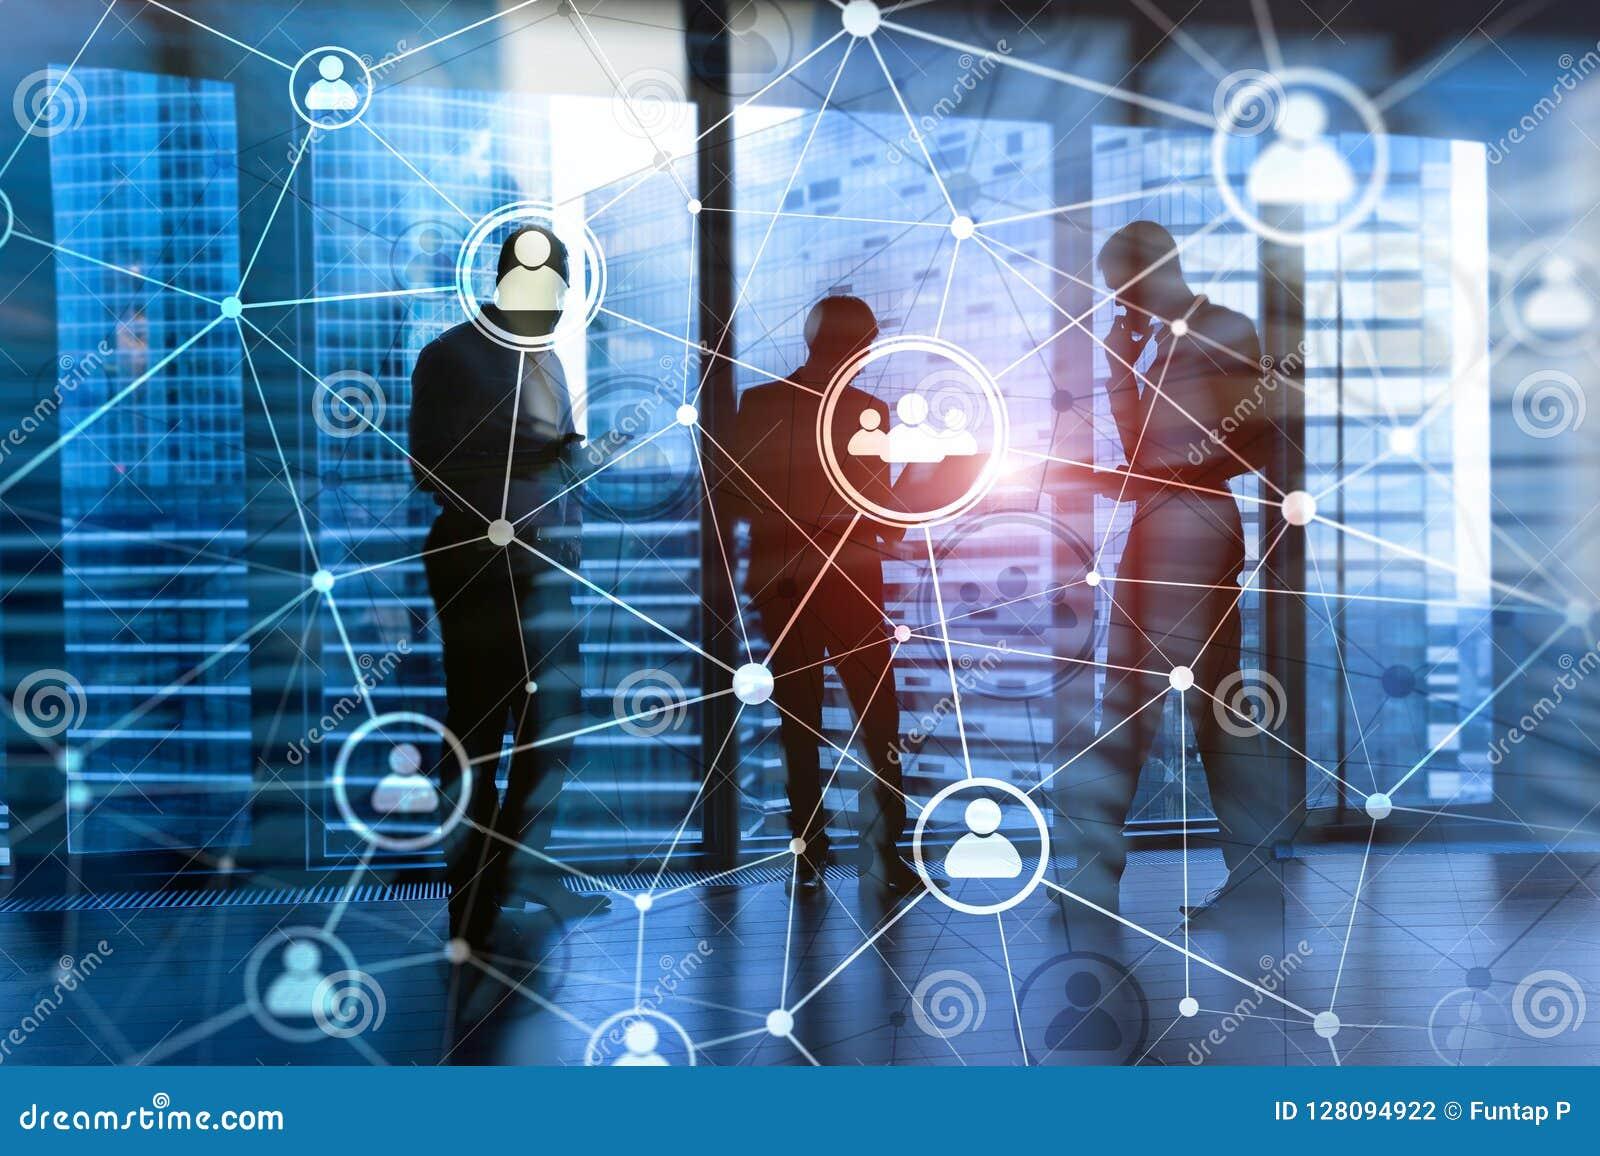 Double exposure people network structureþþ HR - Human resources management and recruitment concept